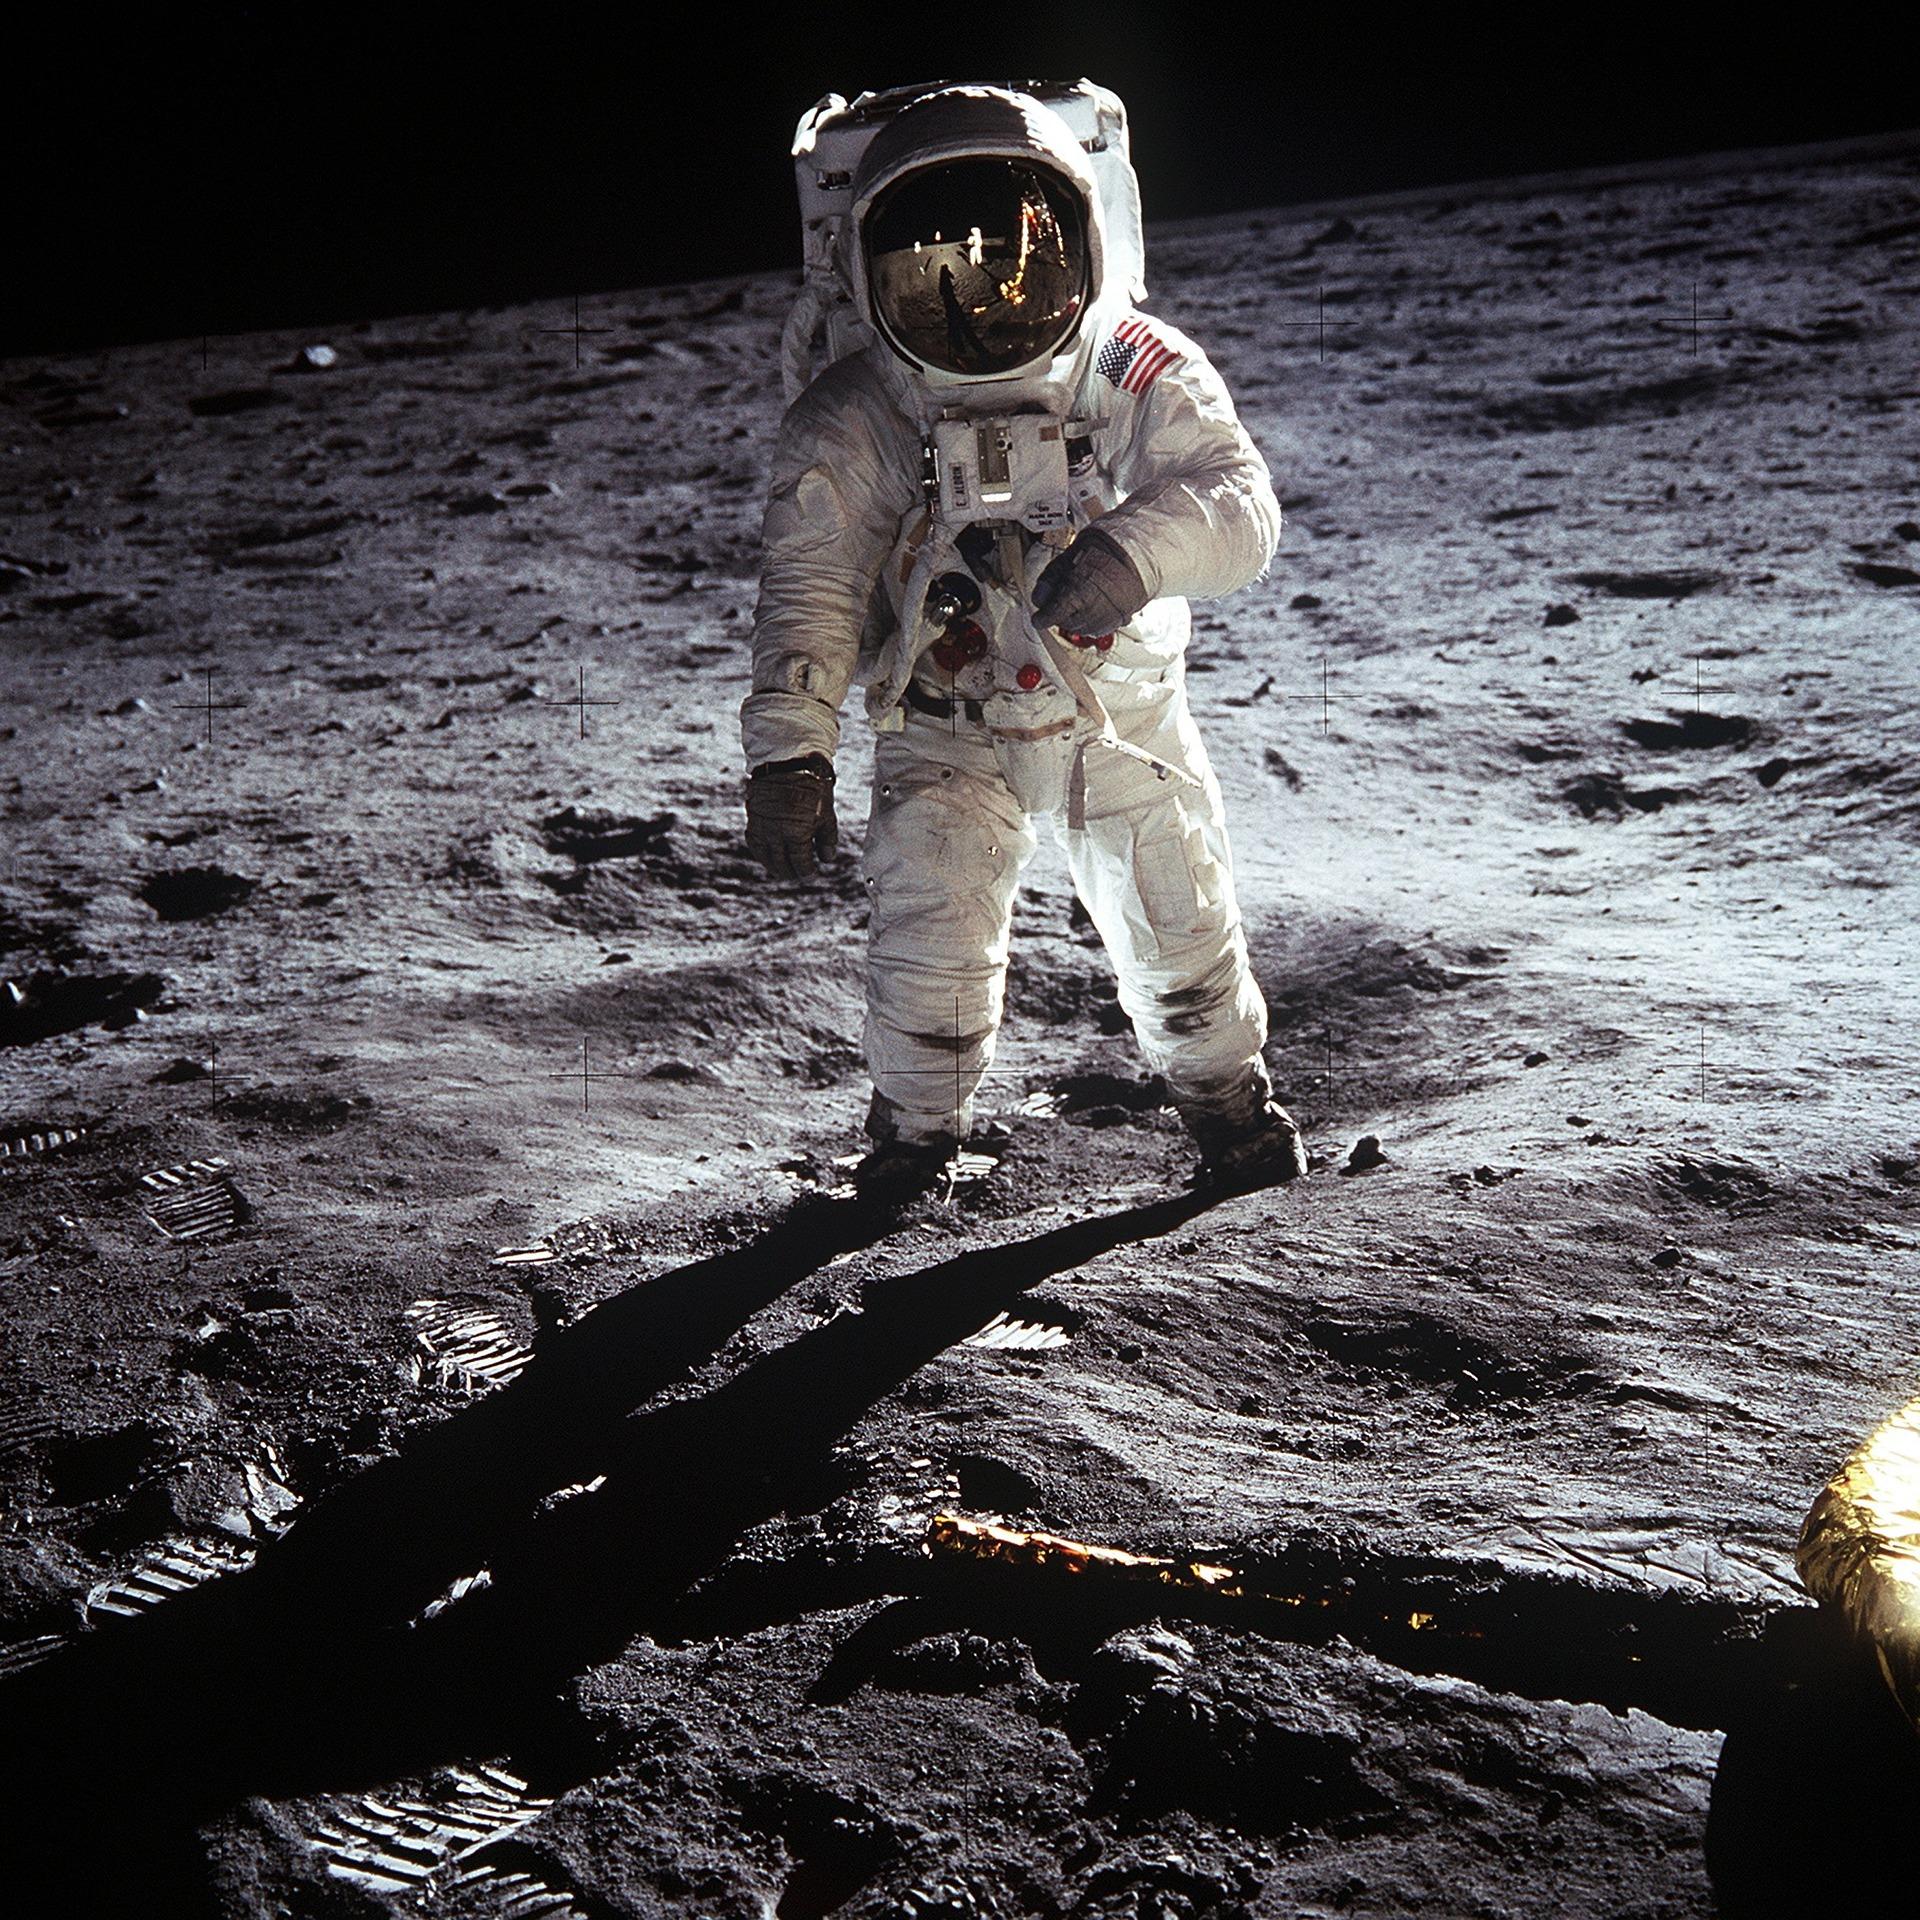 moon-landing-60582_1920.jpg